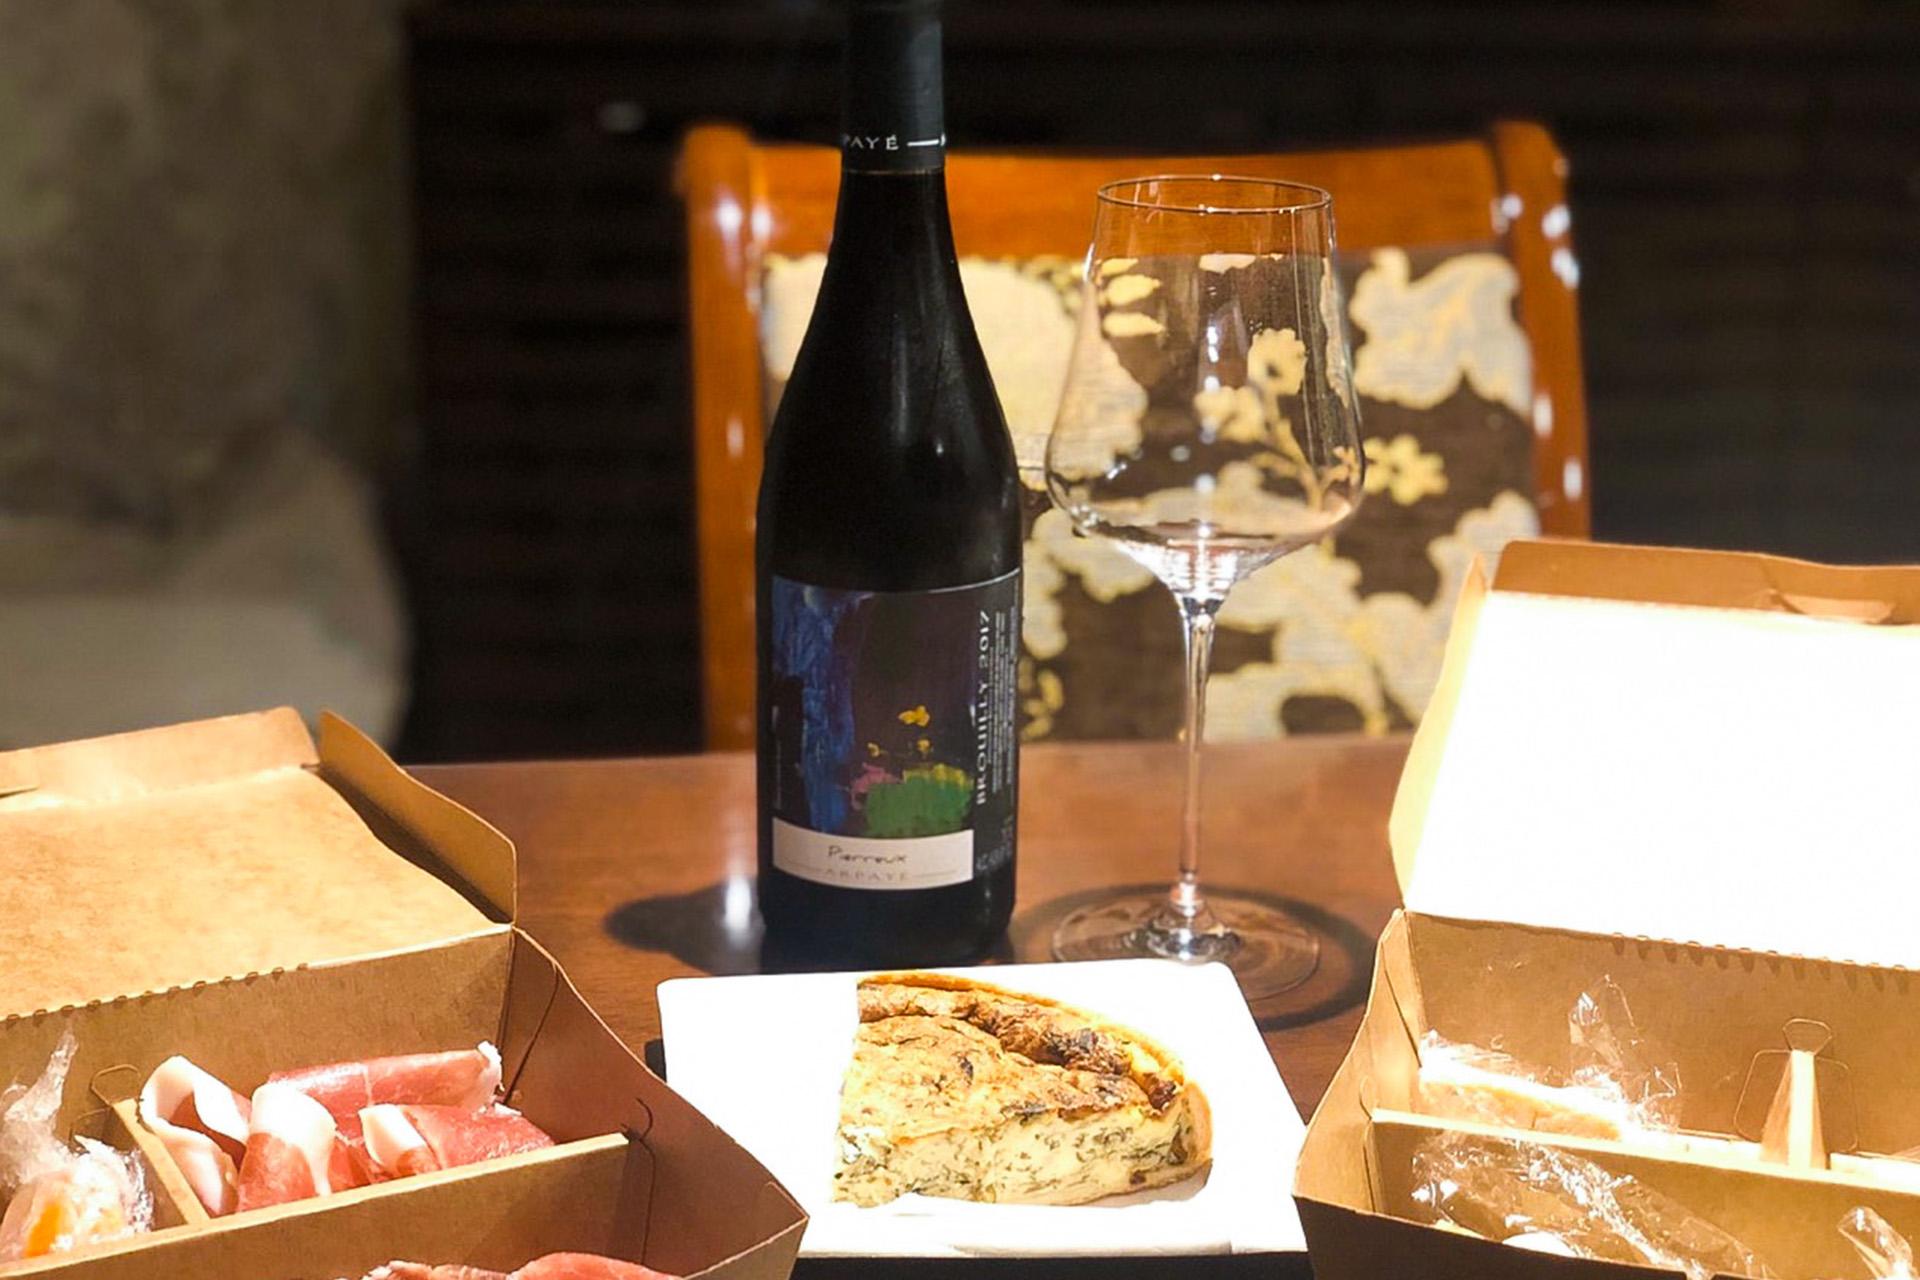 Online wine tasting by apéro- アペロ ワインバー / オーガニックワインxフランス家庭料理 - 東京都港区南青山3-4-6 / apéro WINEBAR - vins et petits plats français - 2016